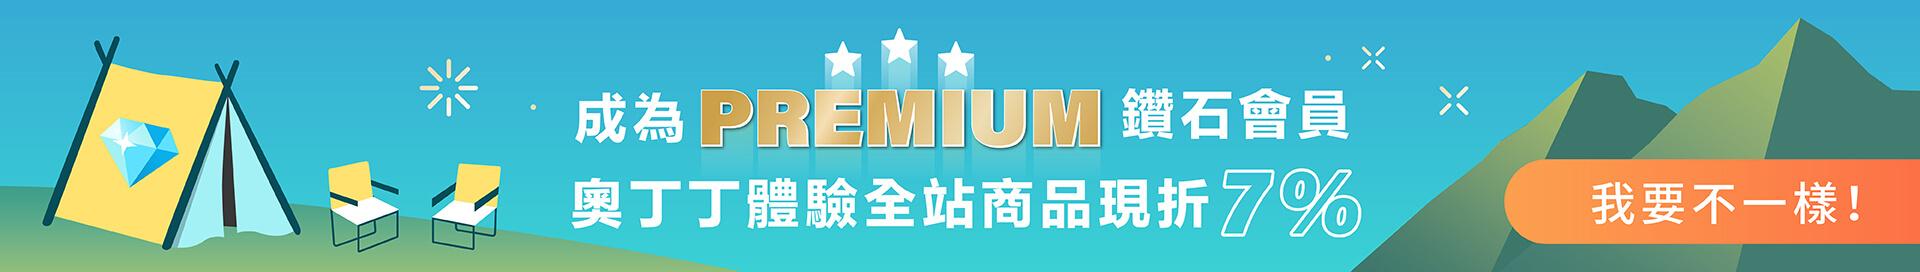 Premium2 萬用banner2